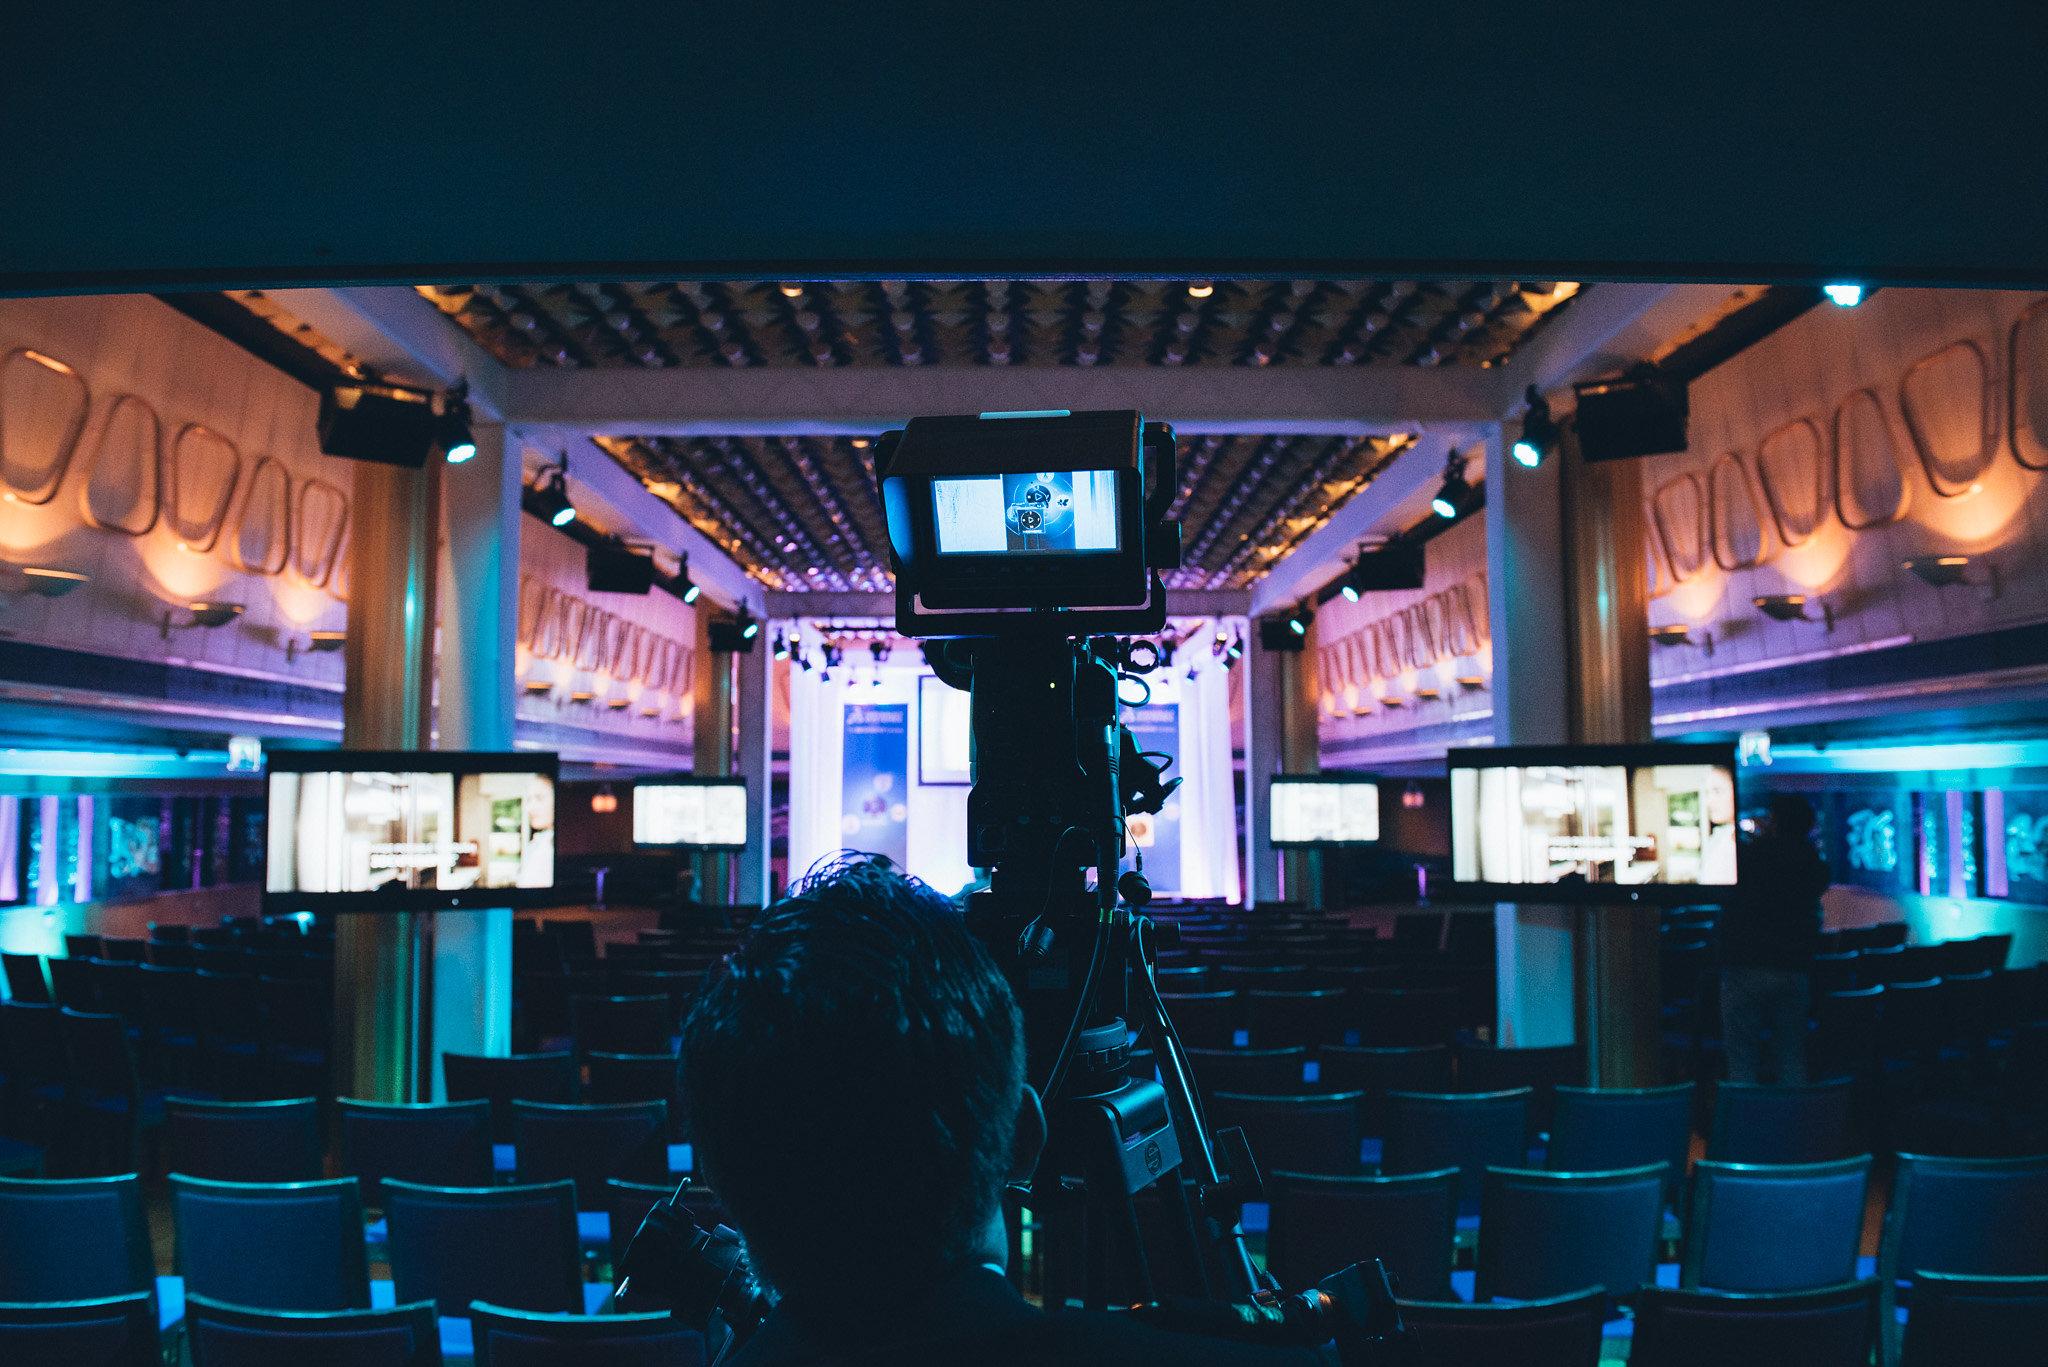 3DX_forum_event_highlights_rotterdam_presentations-1.jpg